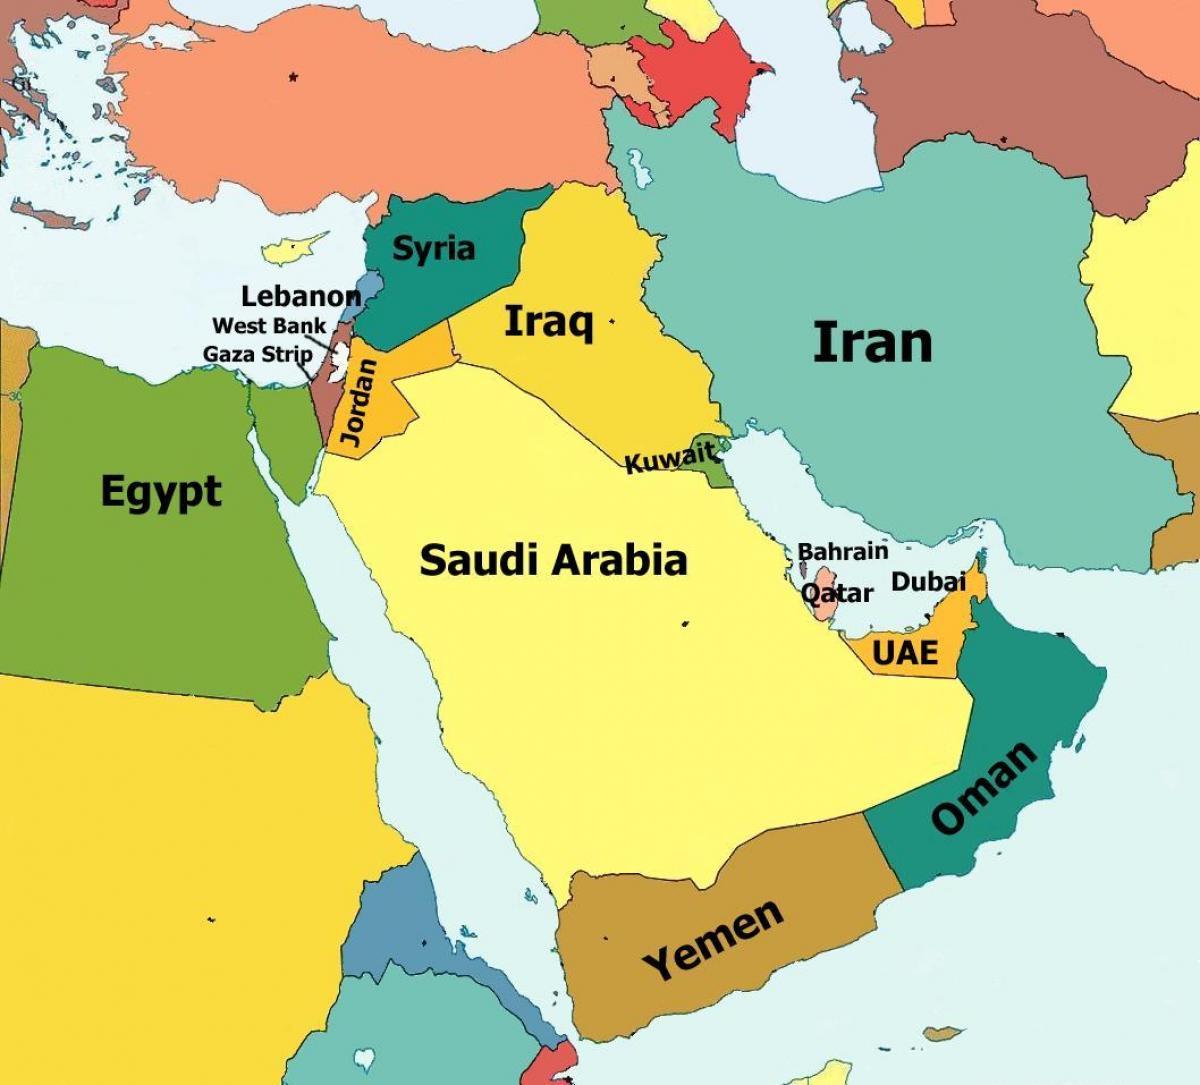 kart over dubai Dubai kart midtøsten   Dubai kart over midt østen (Forente  kart over dubai